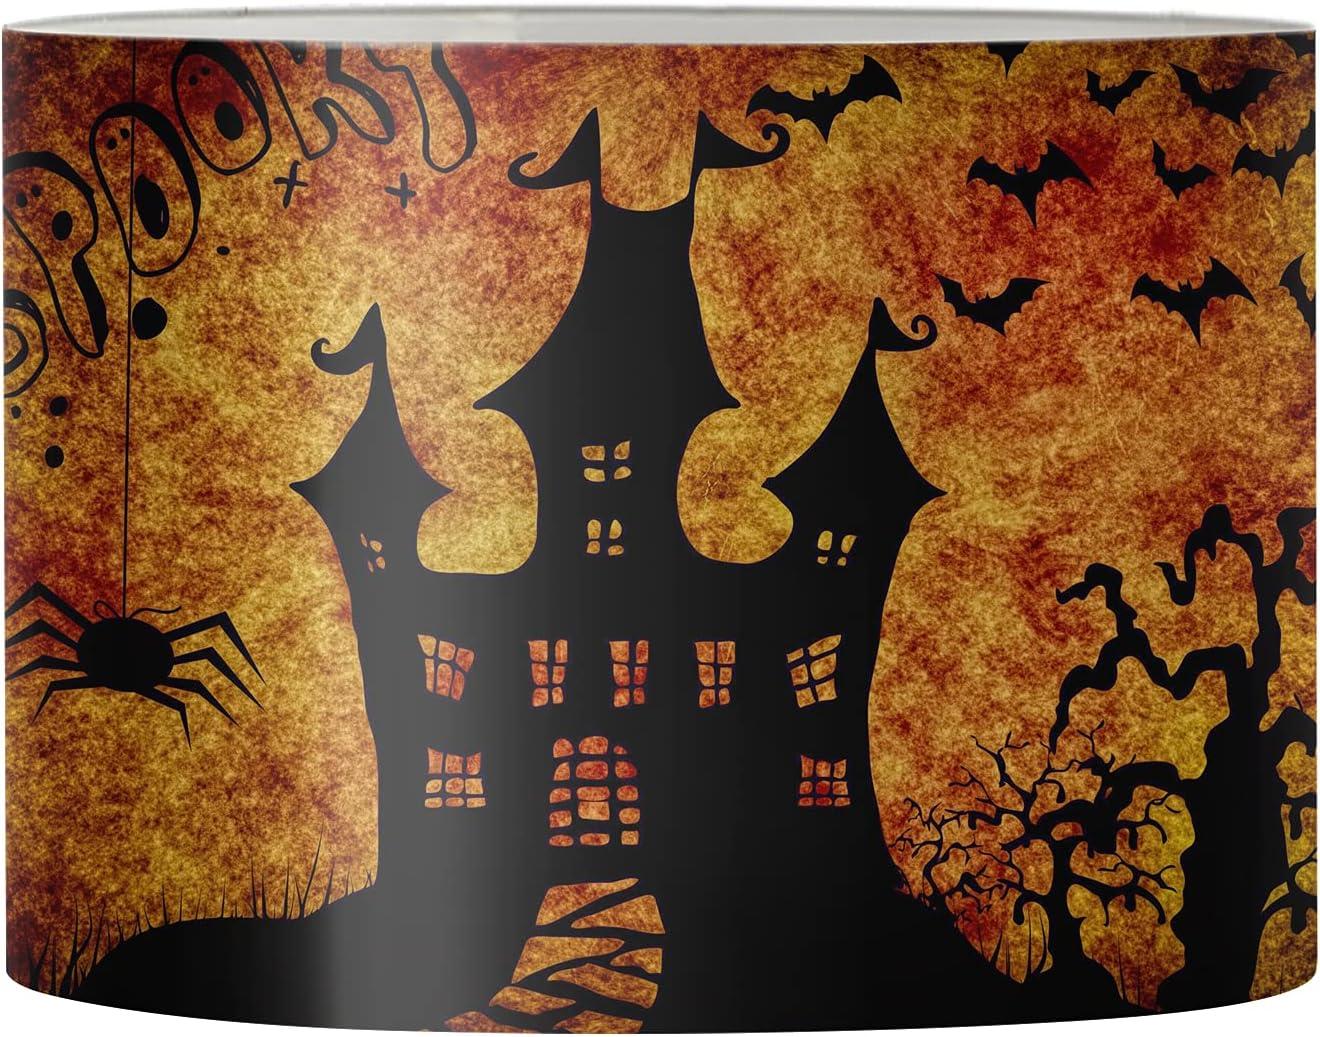 PZZ BEACH Gloomy Castle Lamp Dedication Fabric Decoration Ranking TOP14 Shades Home Shade